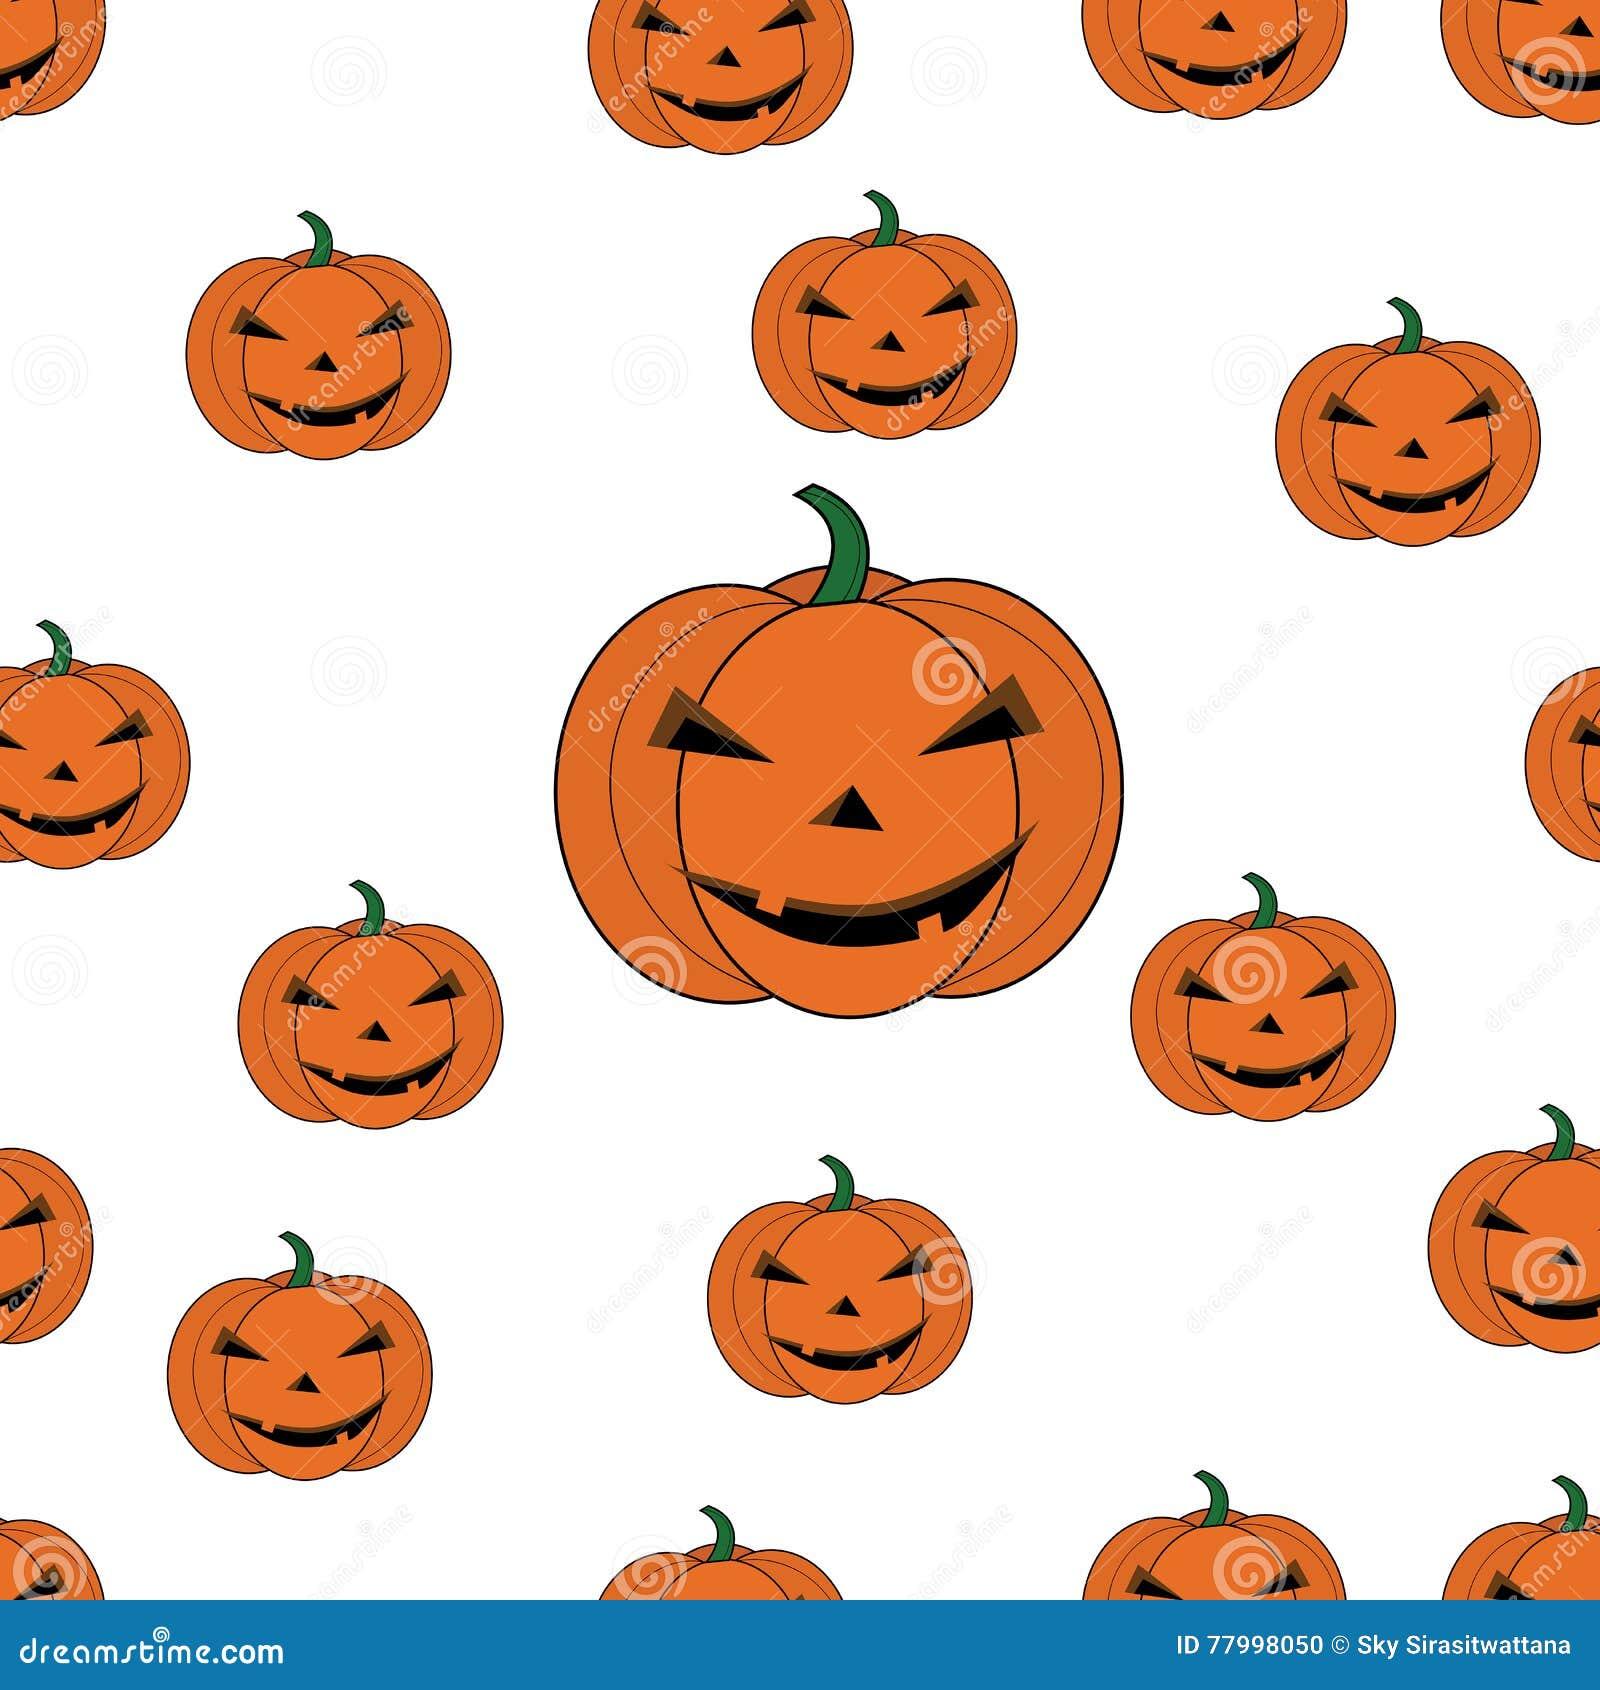 Seamless Pattern Pumpkin Cartoon For Halloween Card Wallpaper Background Stock Vector Illustration Of Fruits Celebrations 77998050